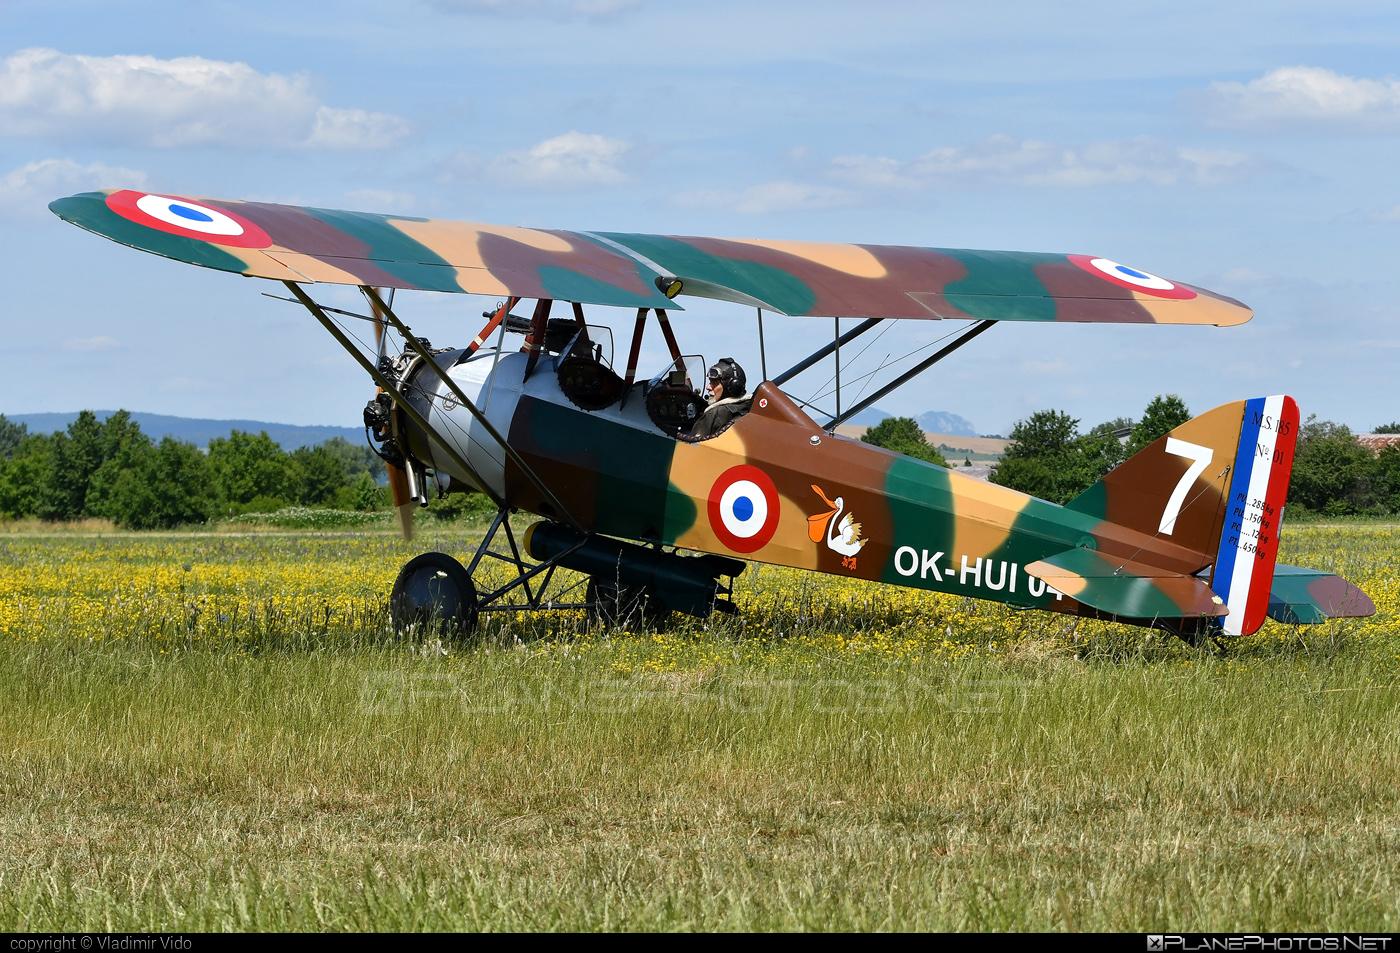 Morane Saulnier MS.185 (replica) - OK-HUI 04 operated by Private operator #moranesaulnier #moranesaulnier185 #ms185 #ms185replica